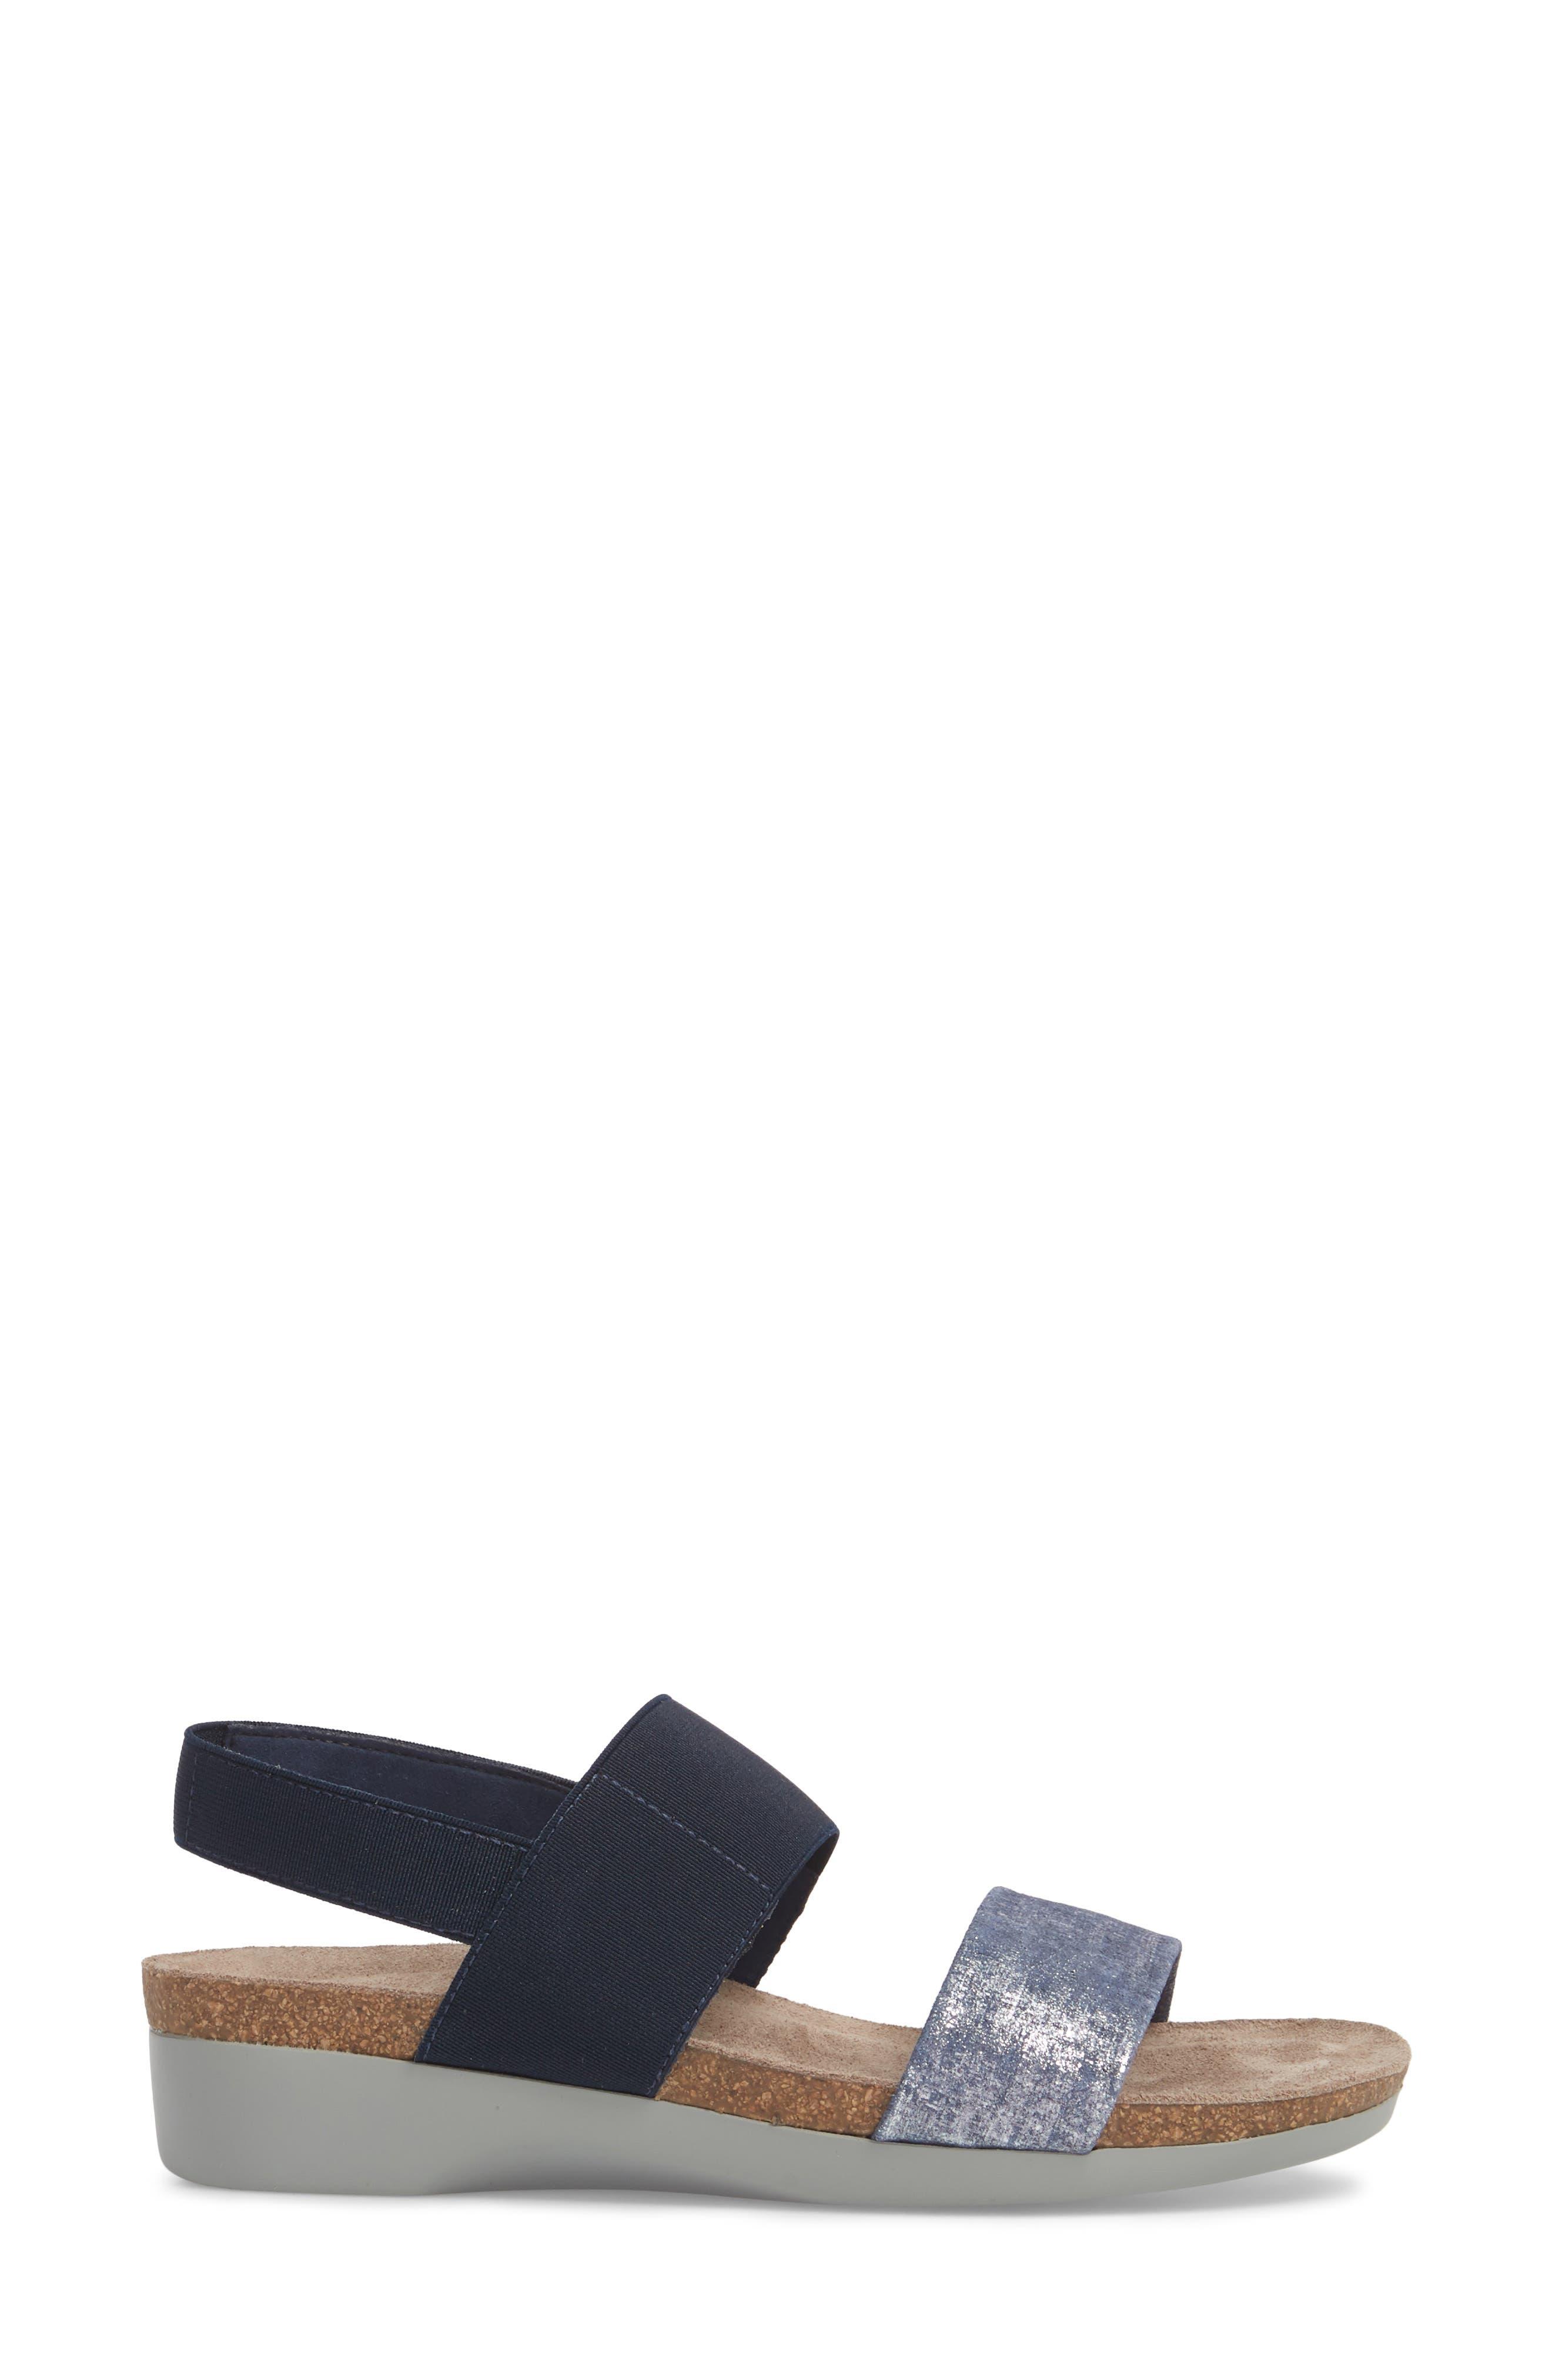 'Pisces' Sandal,                             Alternate thumbnail 3, color,                             BLUE/ SILVER METALLIC